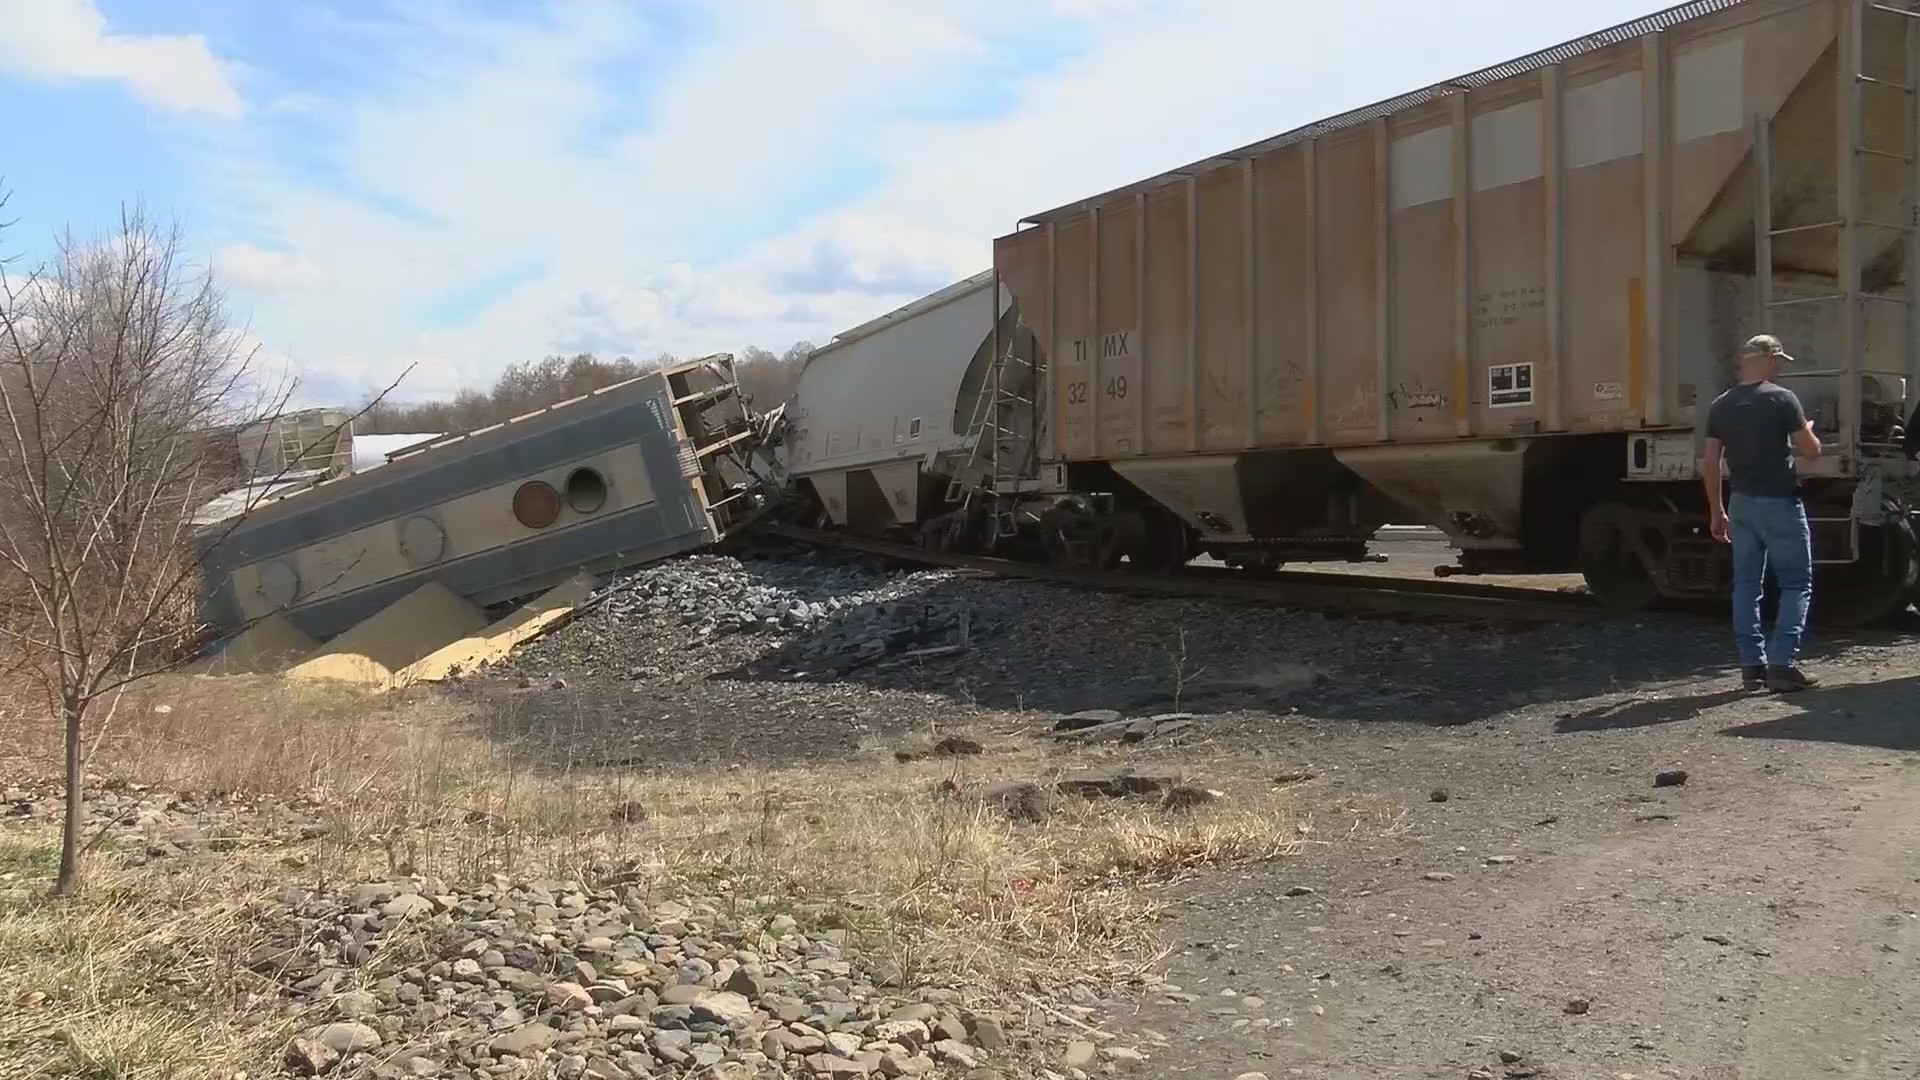 Train_derails_in_Dickson_City_0_20190409220644-60044163